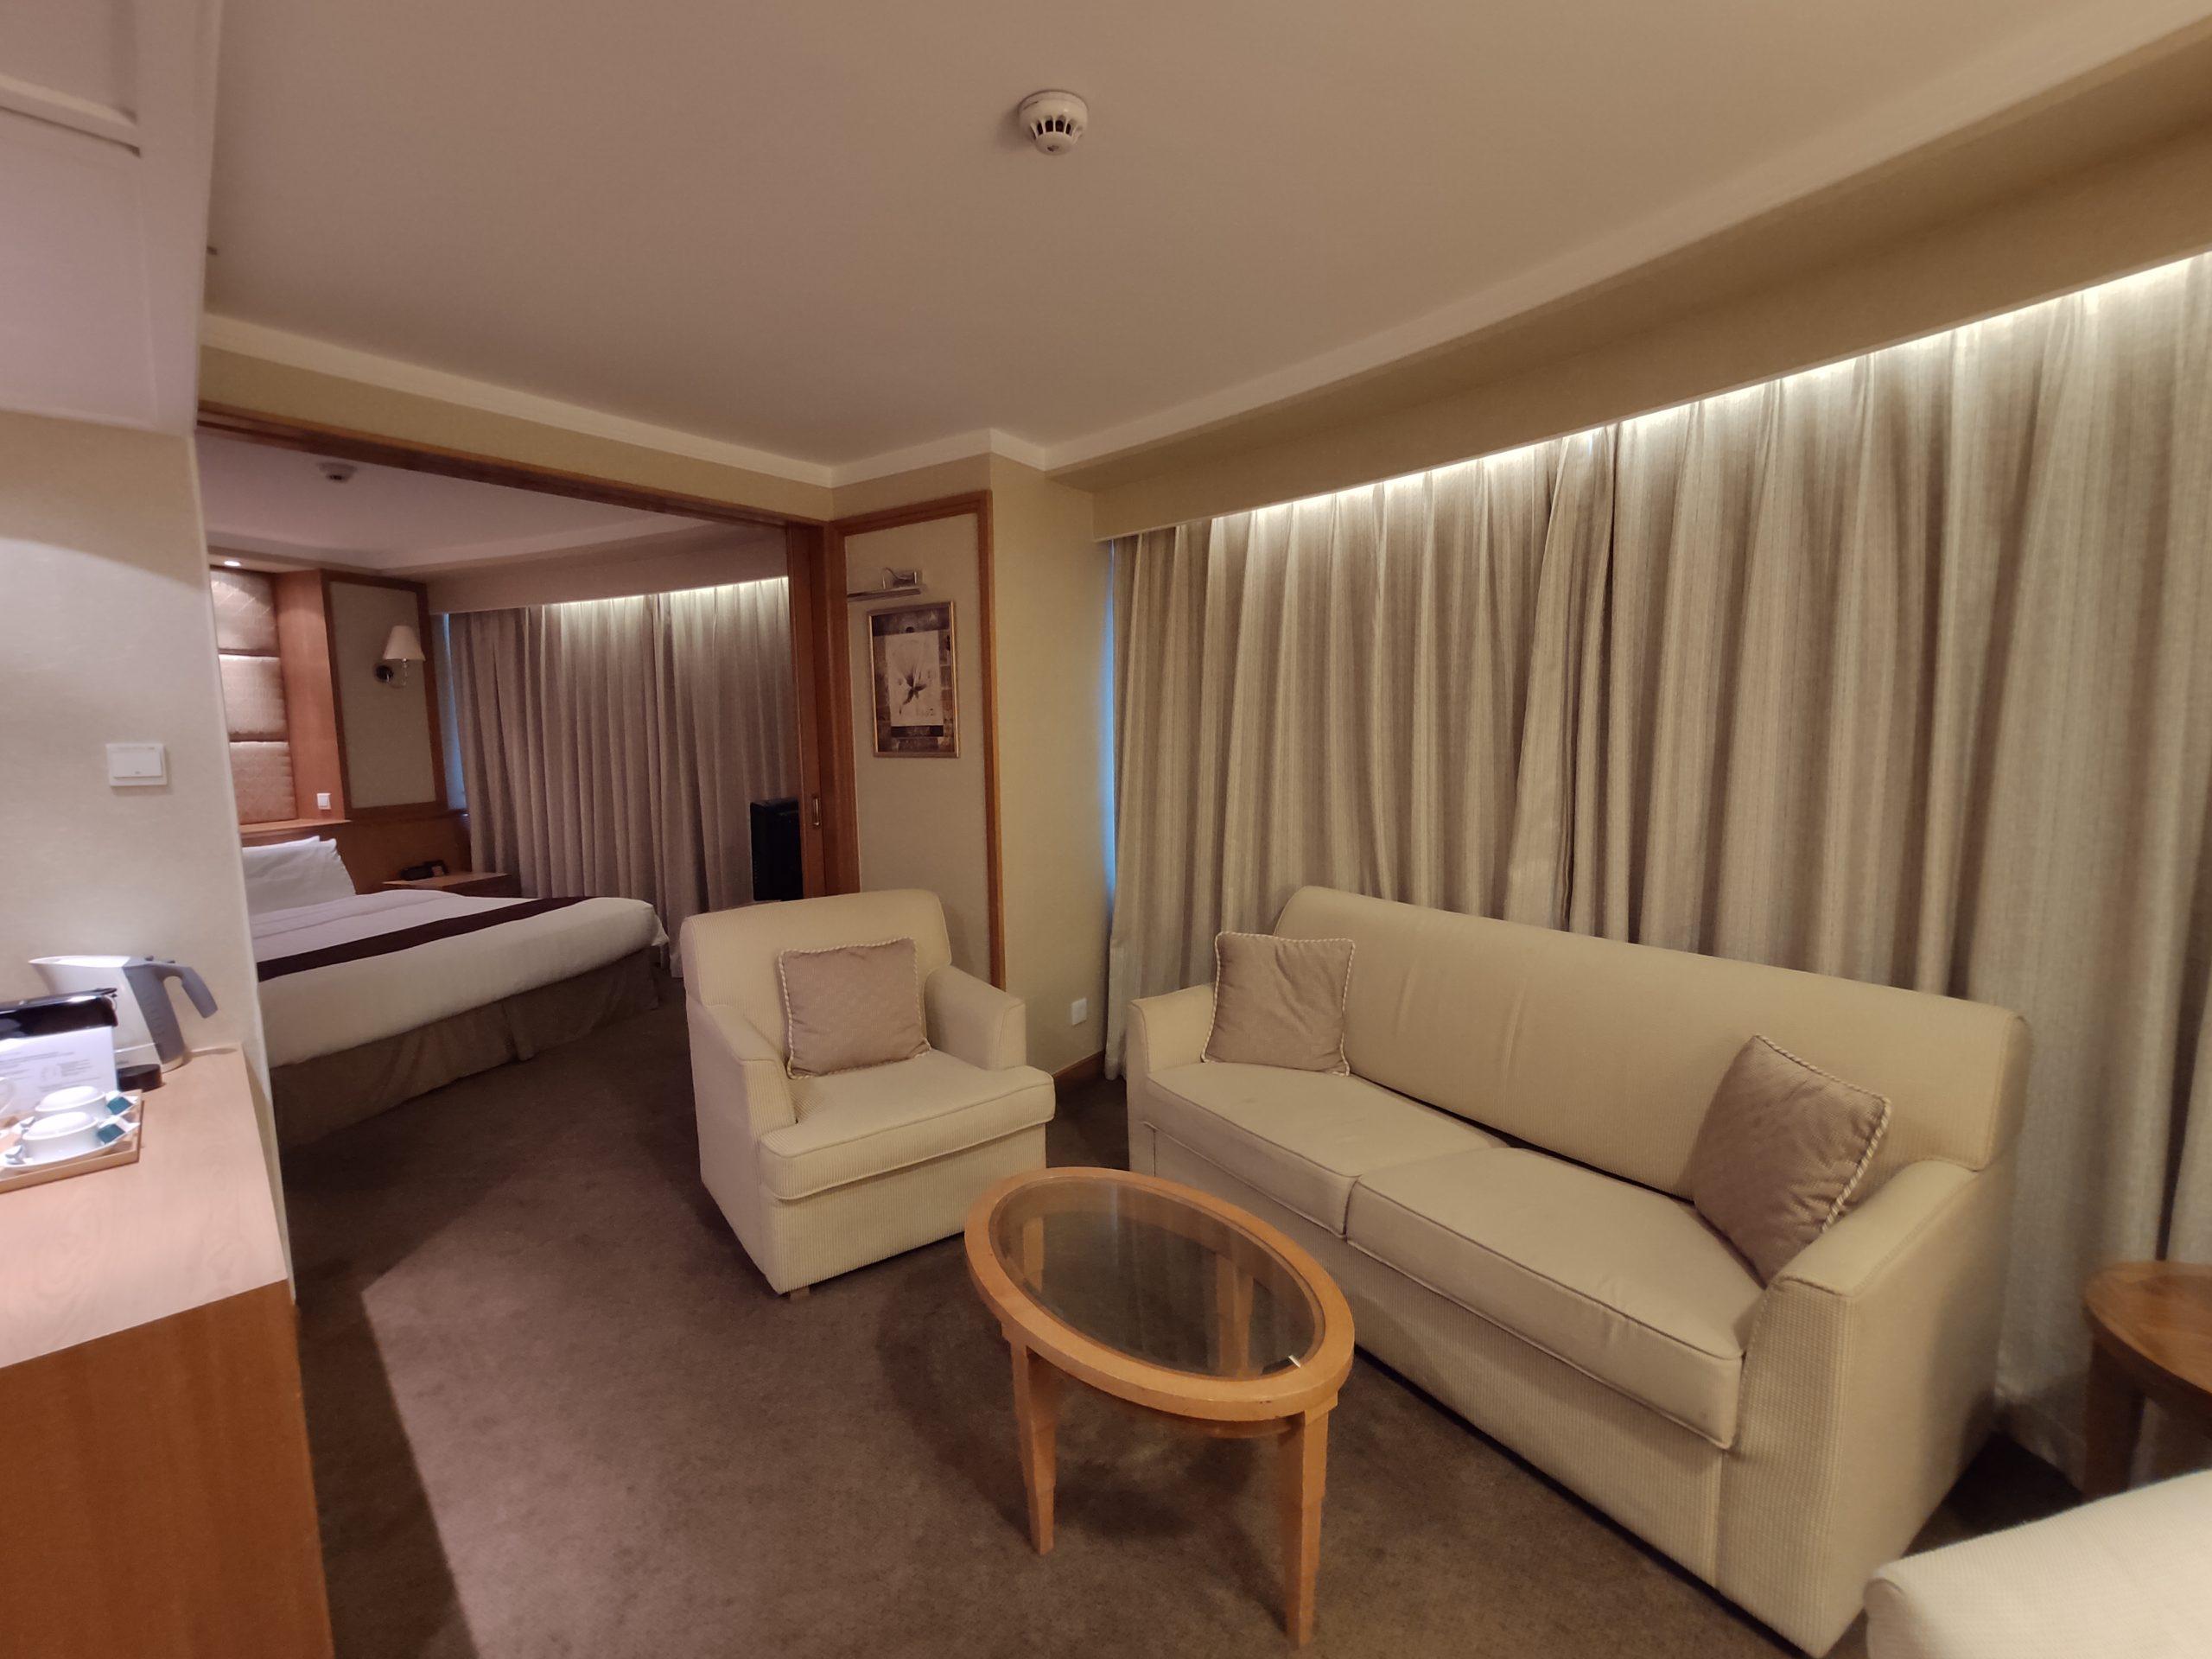 [Review] South Pacific Hotel (Executive Studio) @ Hong Kong